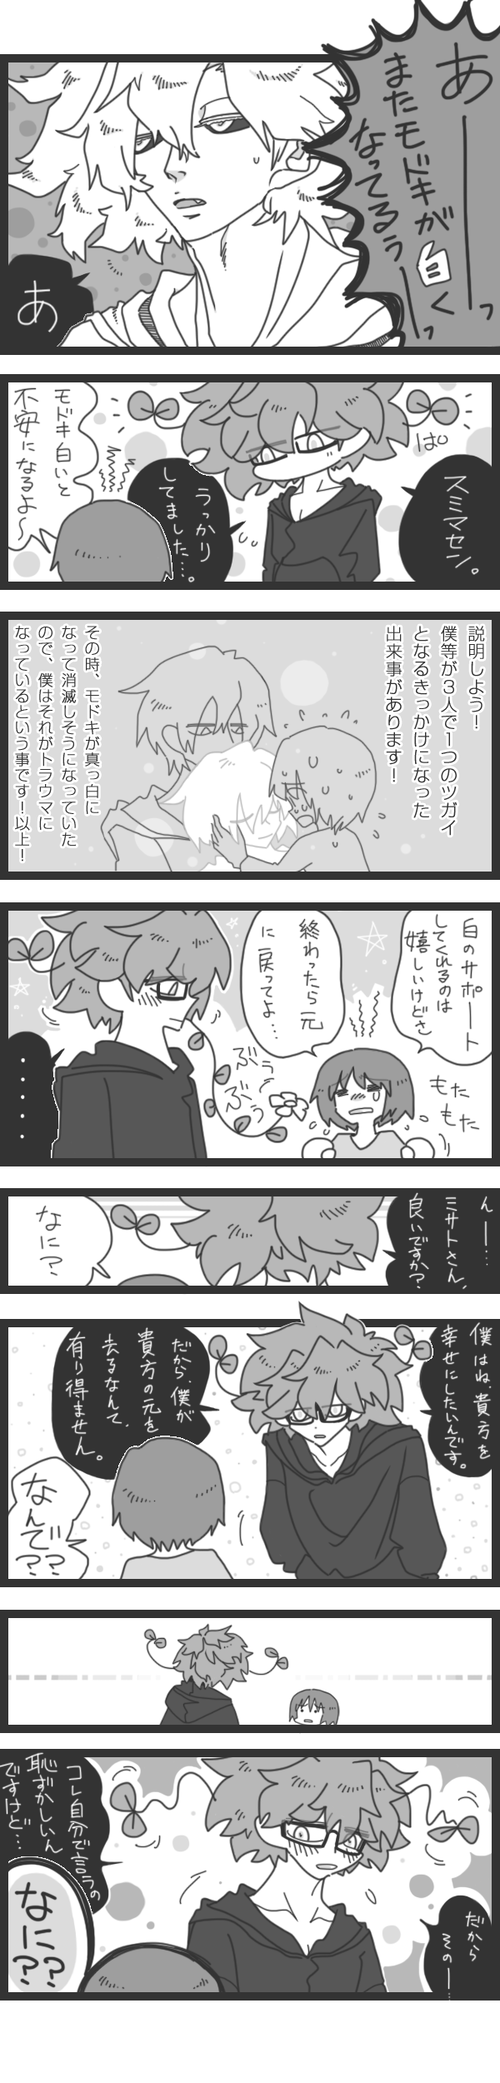 siawase_no_jouken_200524